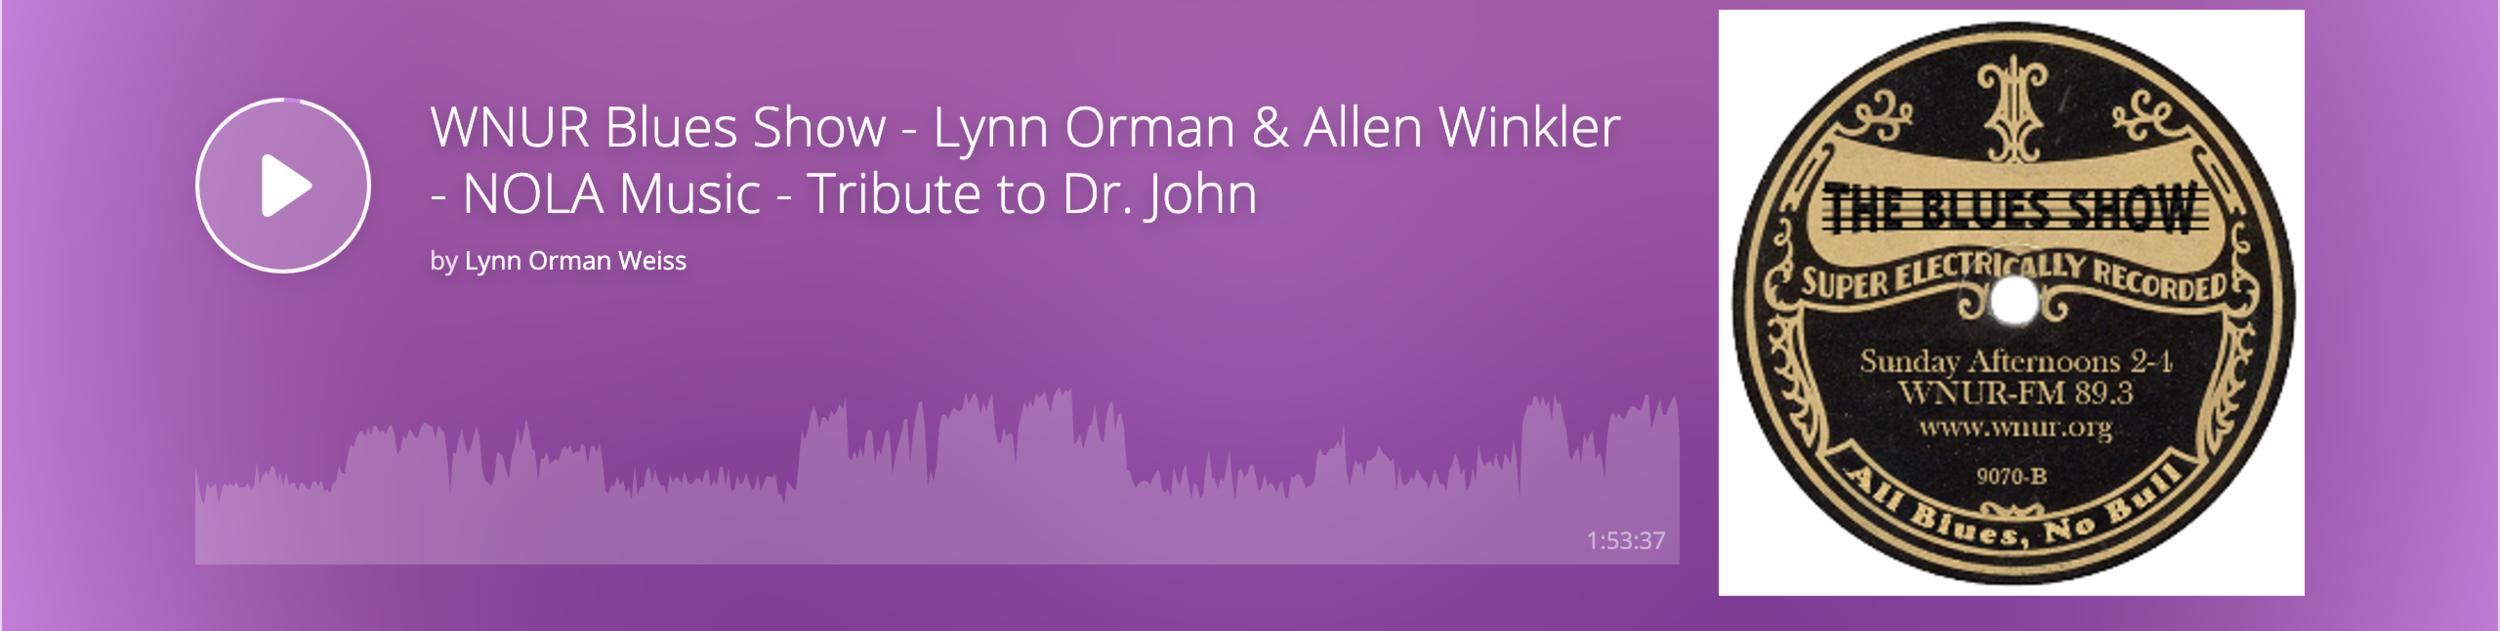 https://www.mixcloud.com/lynnormanweiss/wnur-blues-show-lynn-orman-guest-dj-allen-winkler-nola-music-and-tribute-to-dr-john/